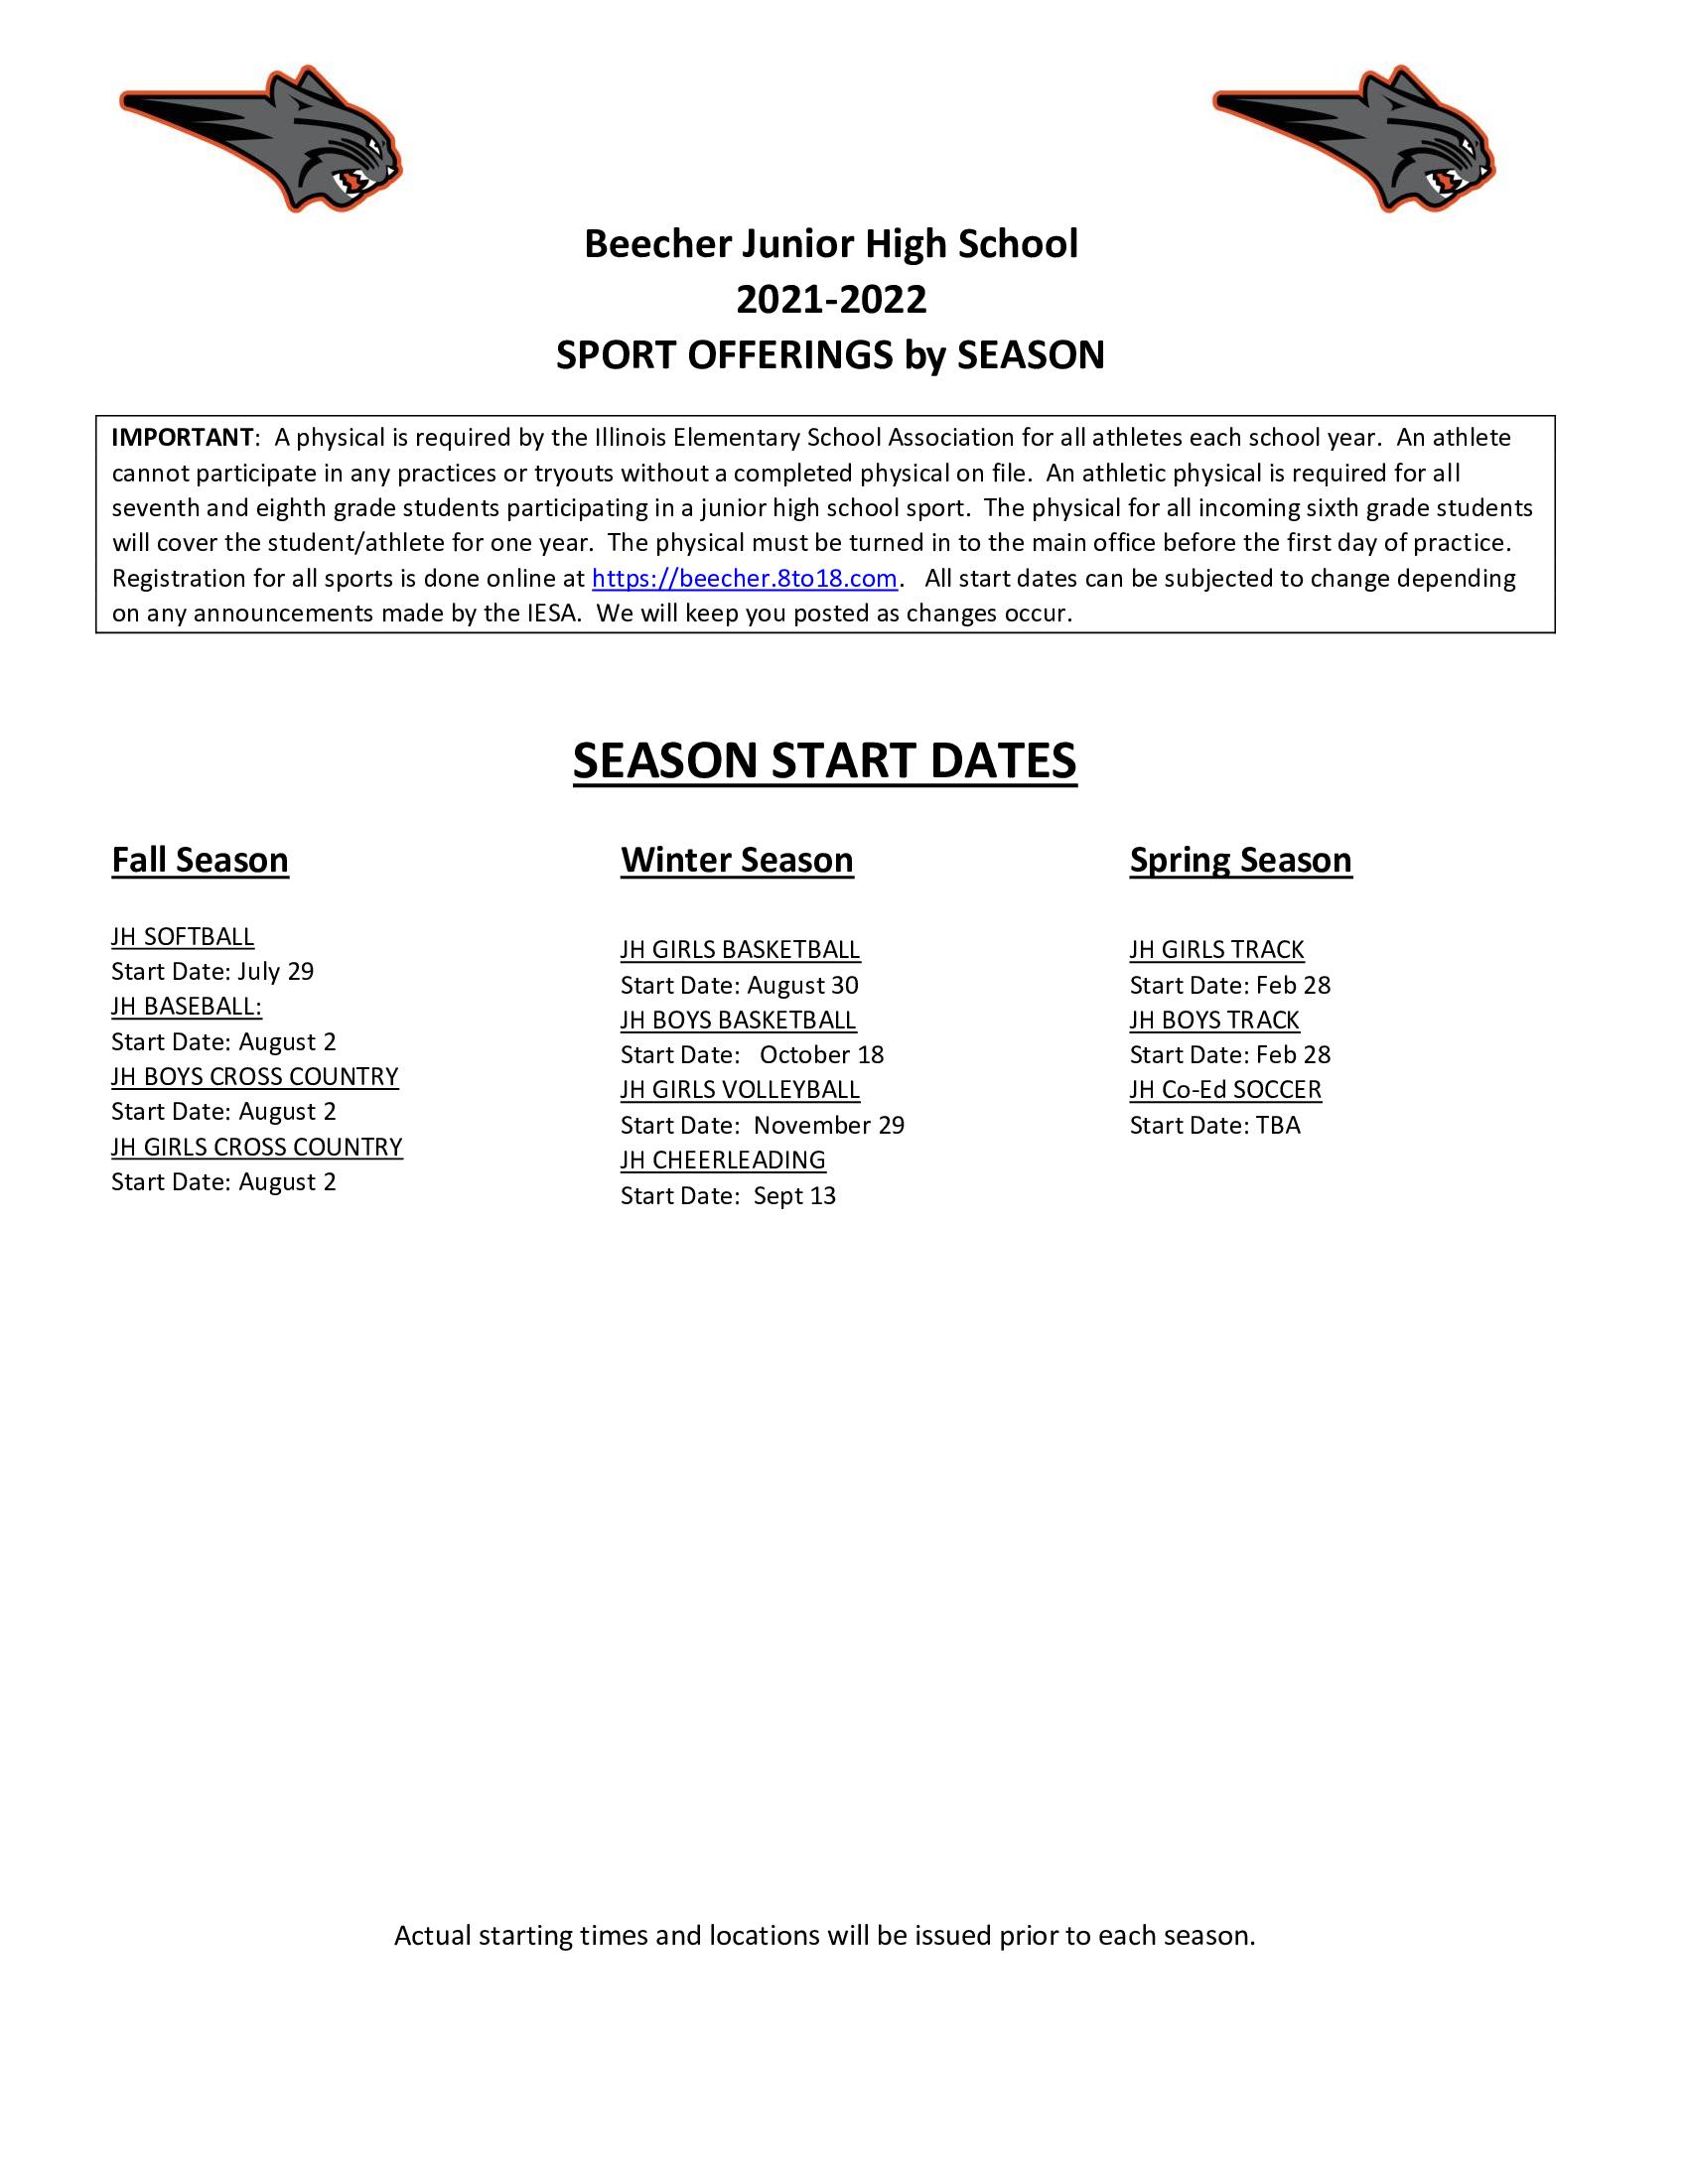 2021-2022 Sports